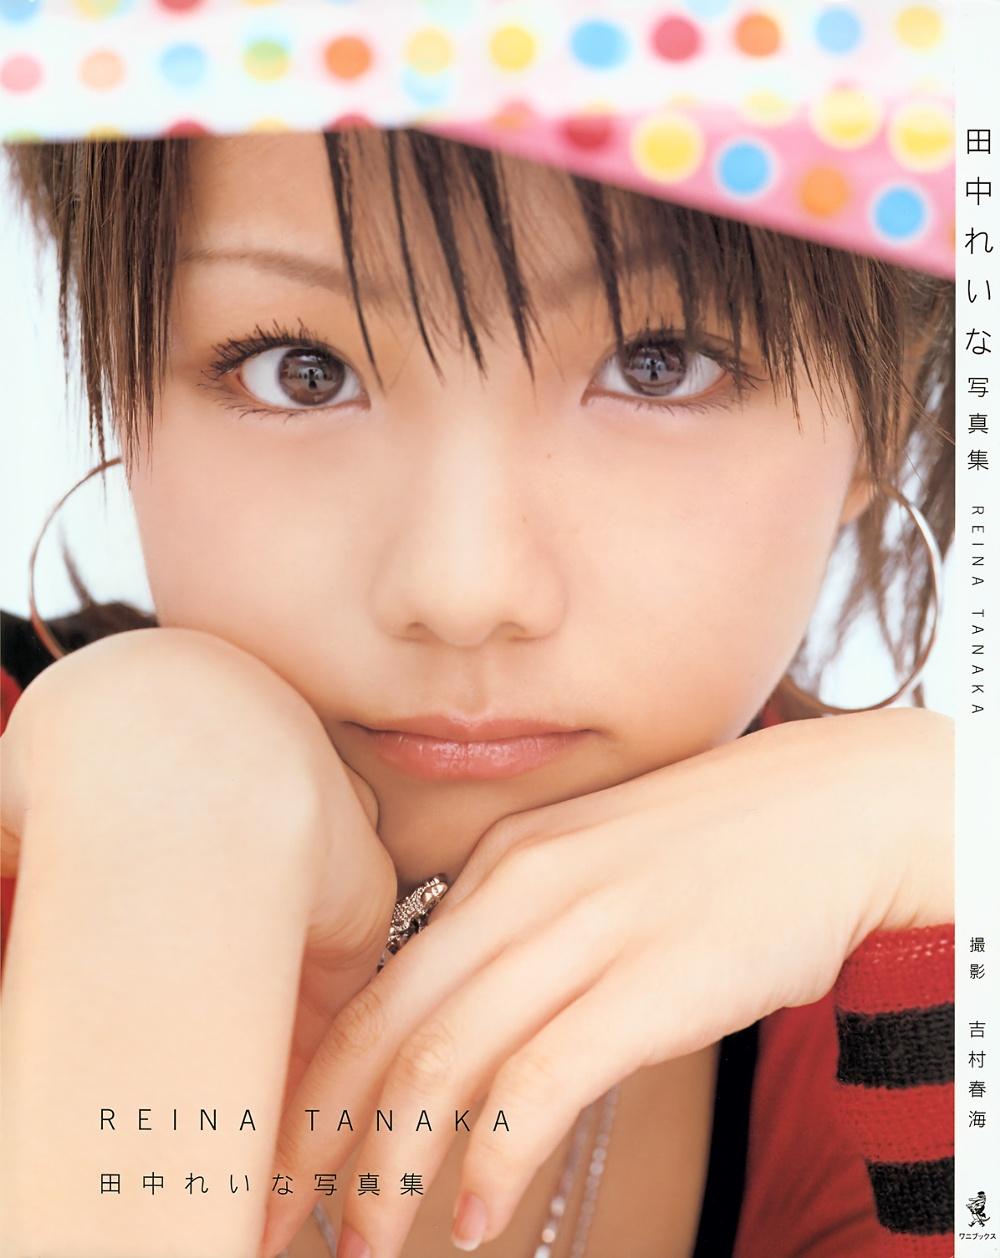 XVIDEOSの最高に抜ける日本人動画 Part41Tube8動画>1本 xvideo>2本 fc2>3本 YouTube動画>2本 ->画像>51枚